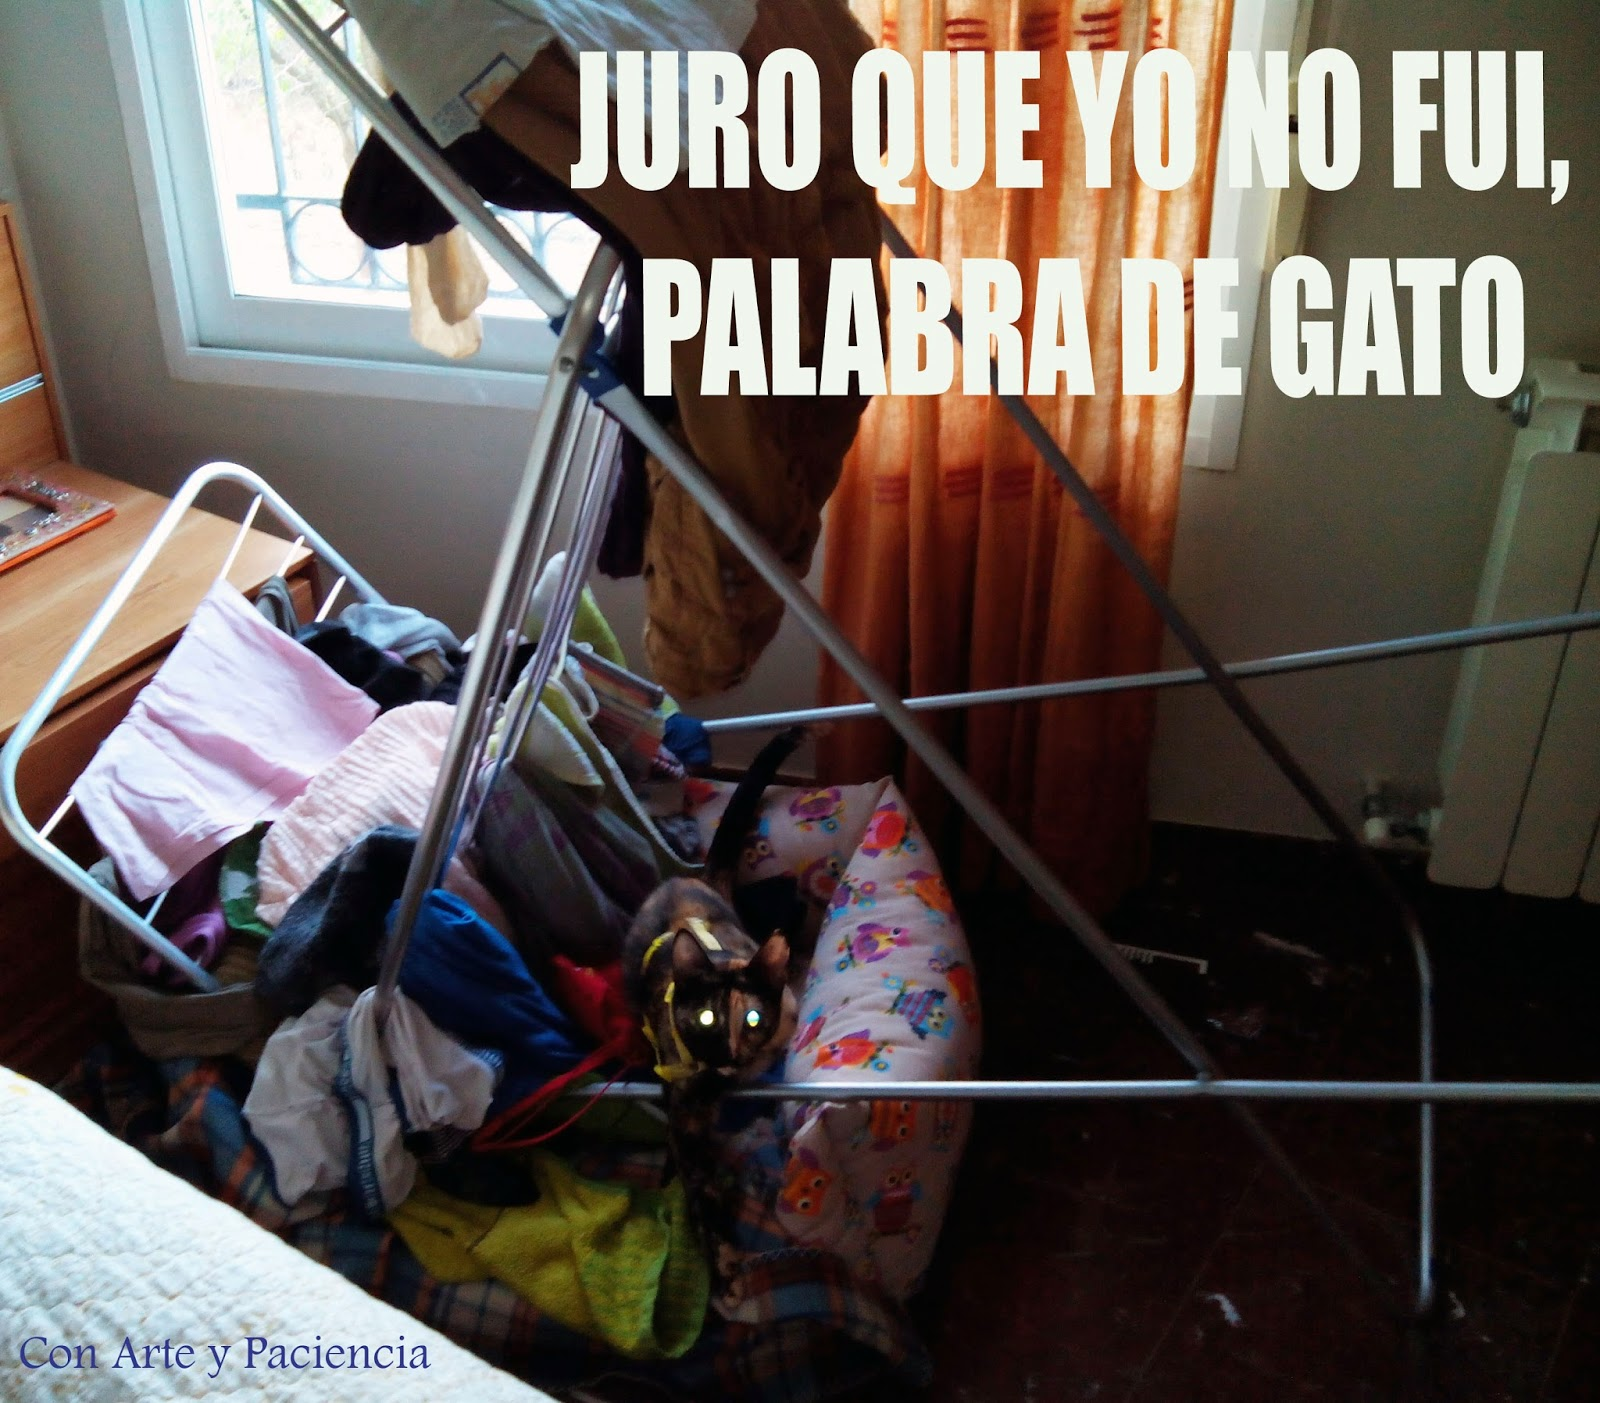 JURO QUE YO NO FUI, PALABRA DE GATO